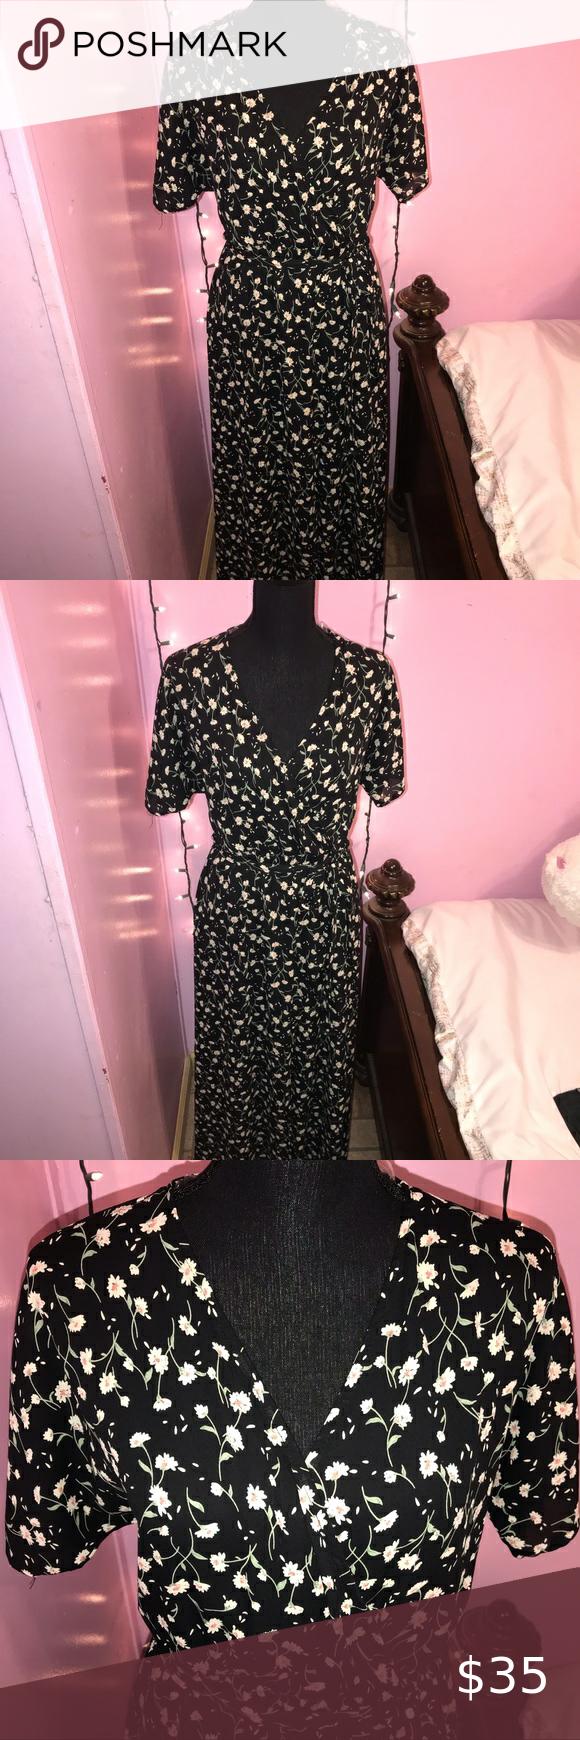 Long Black Dress Long Summer Dresses Long Black Dress Dresses [ 1740 x 580 Pixel ]